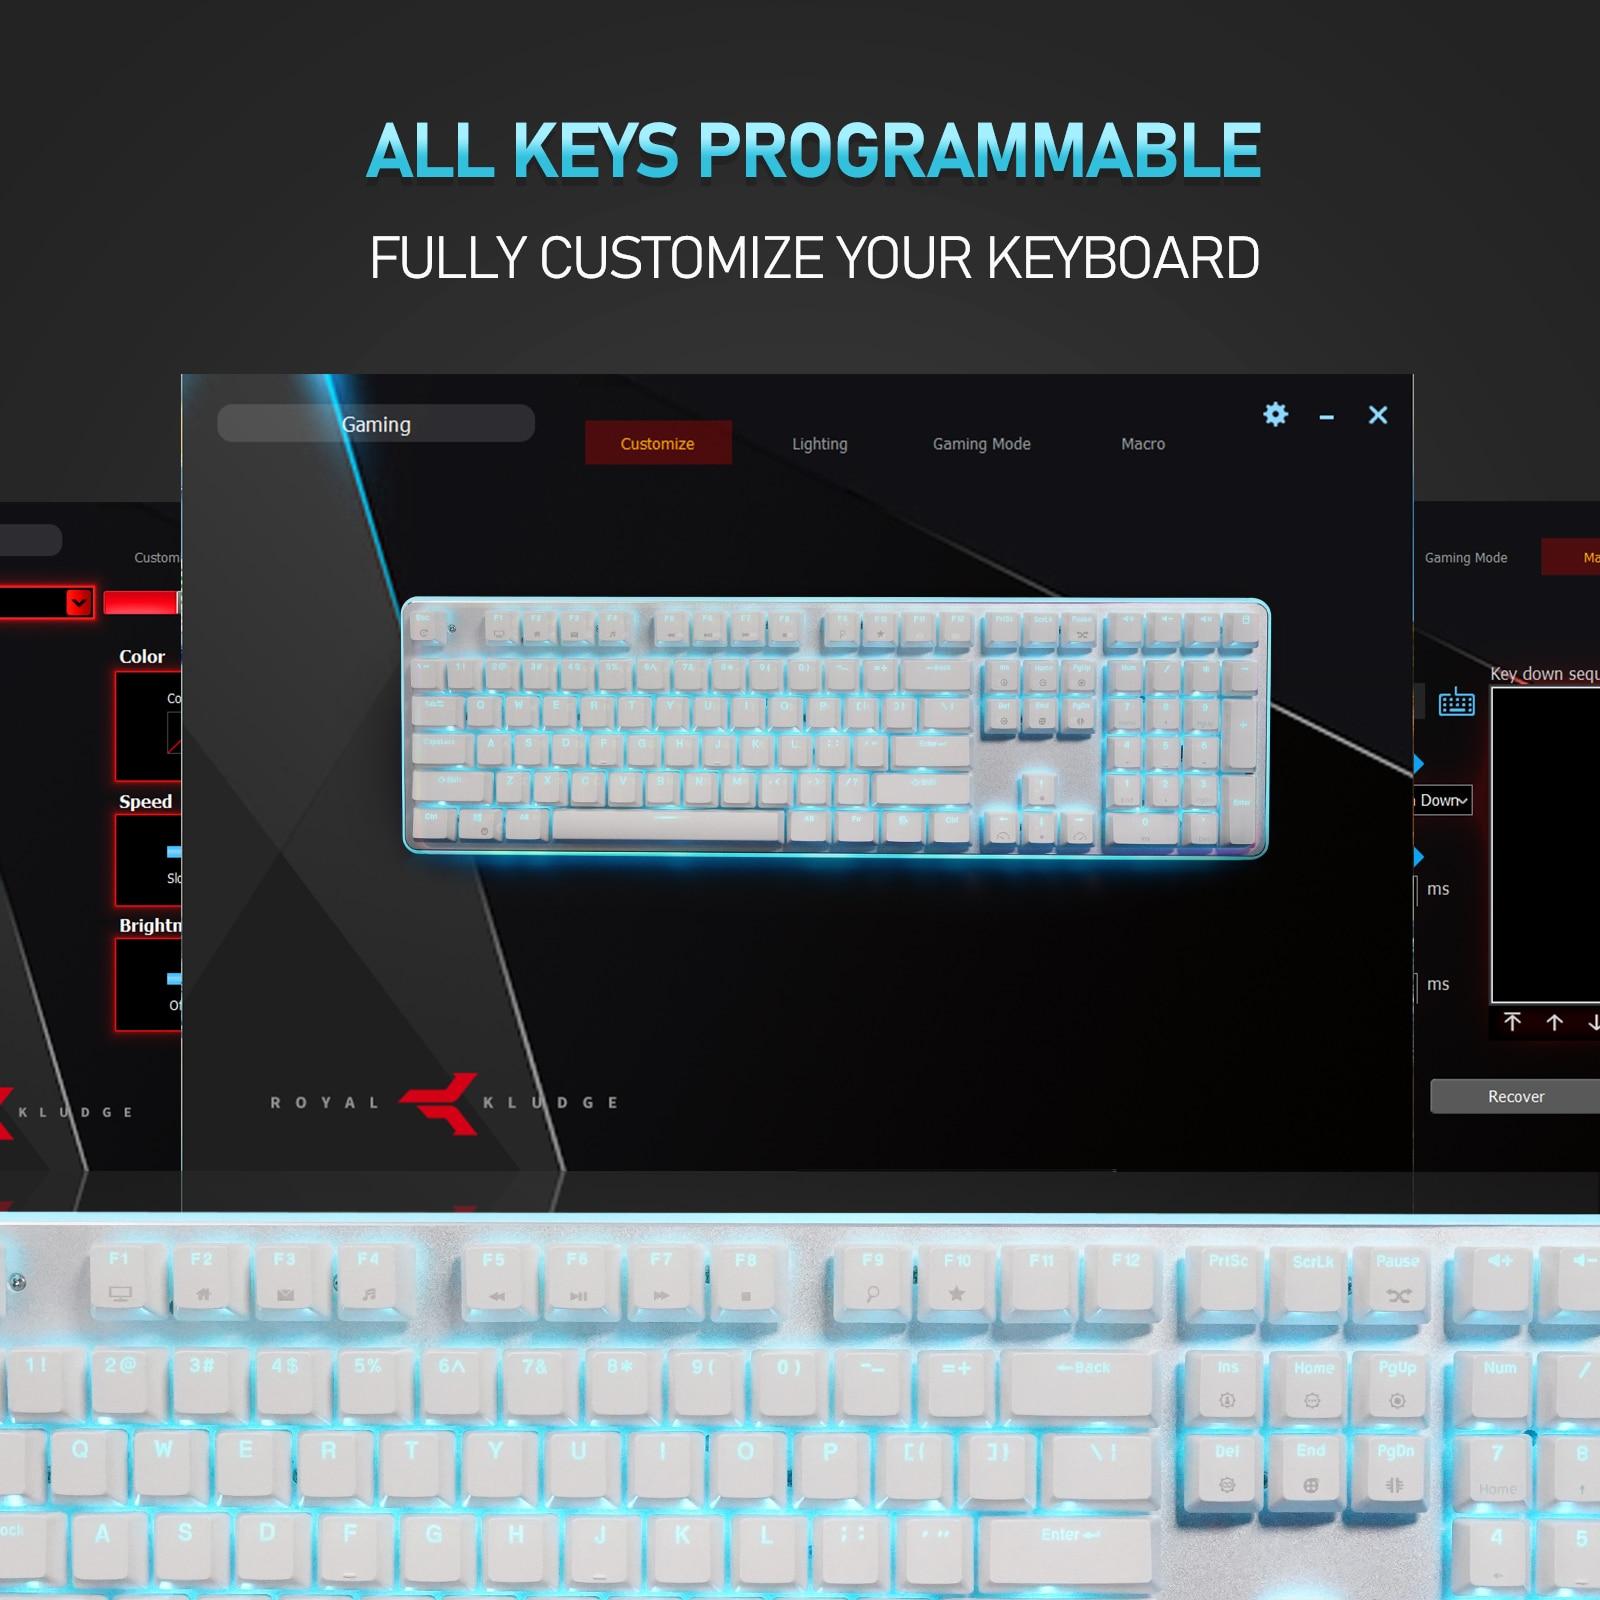 Official Original RK918 Wired Mechanical Keyboard, RGB Backlit Gaming Keyboard with Large LED Sorrounding Side Lamp,108 Keys